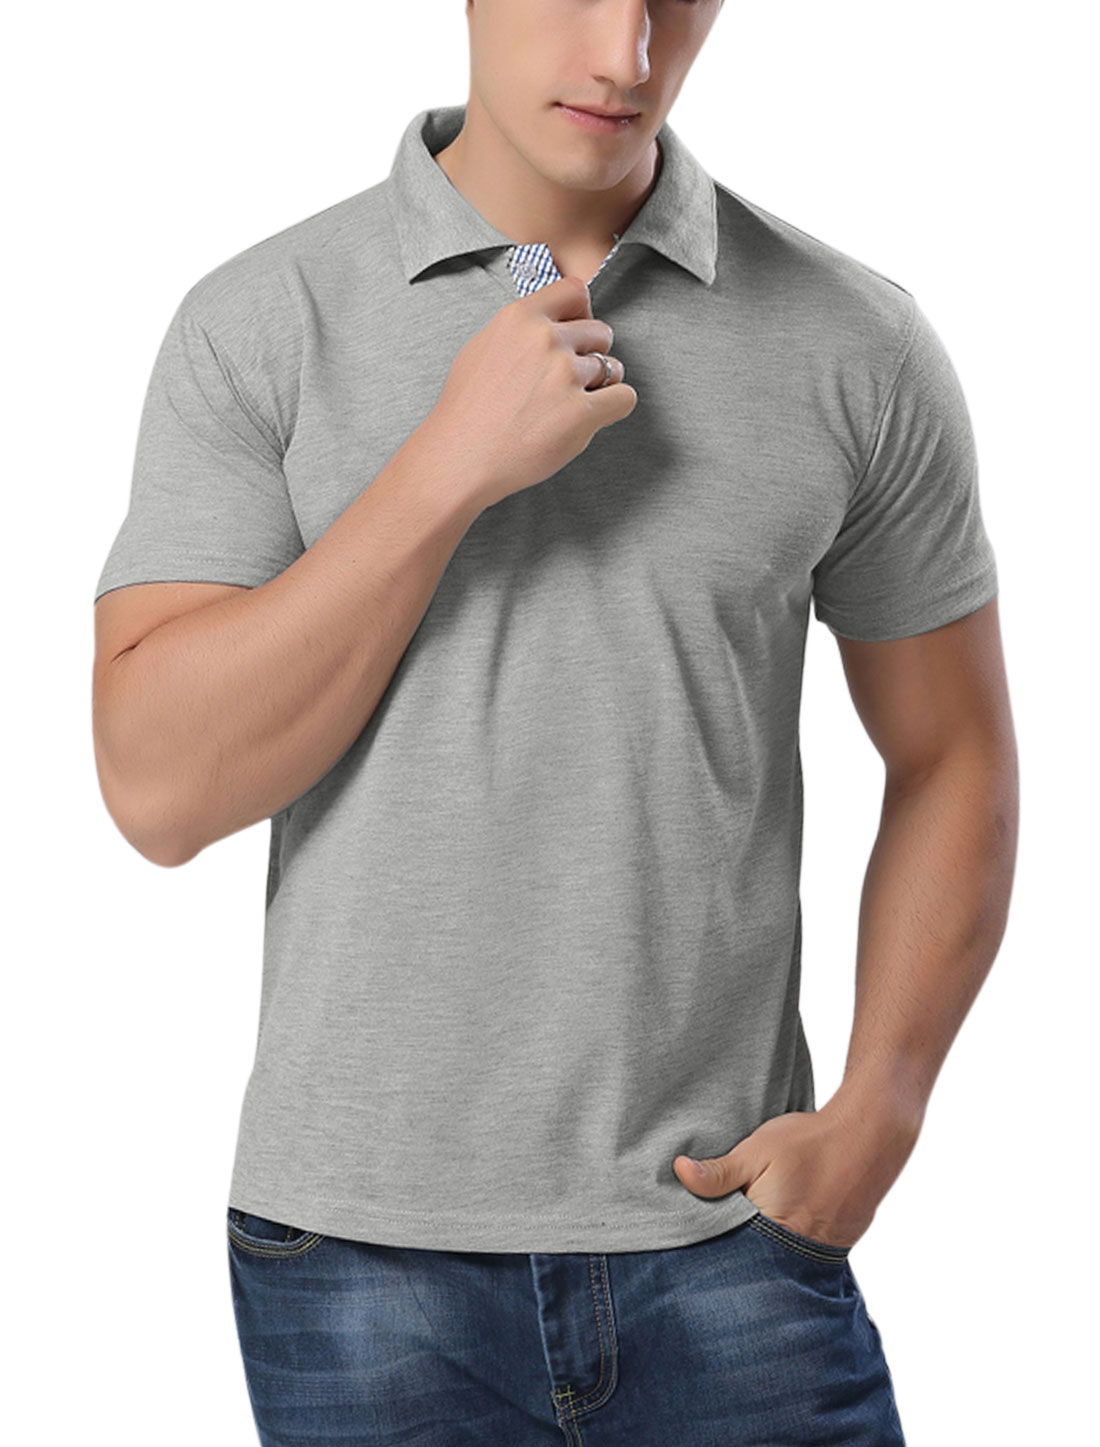 Men Short Sleeves Button Closure Casual Polo Shirts Light Gray M